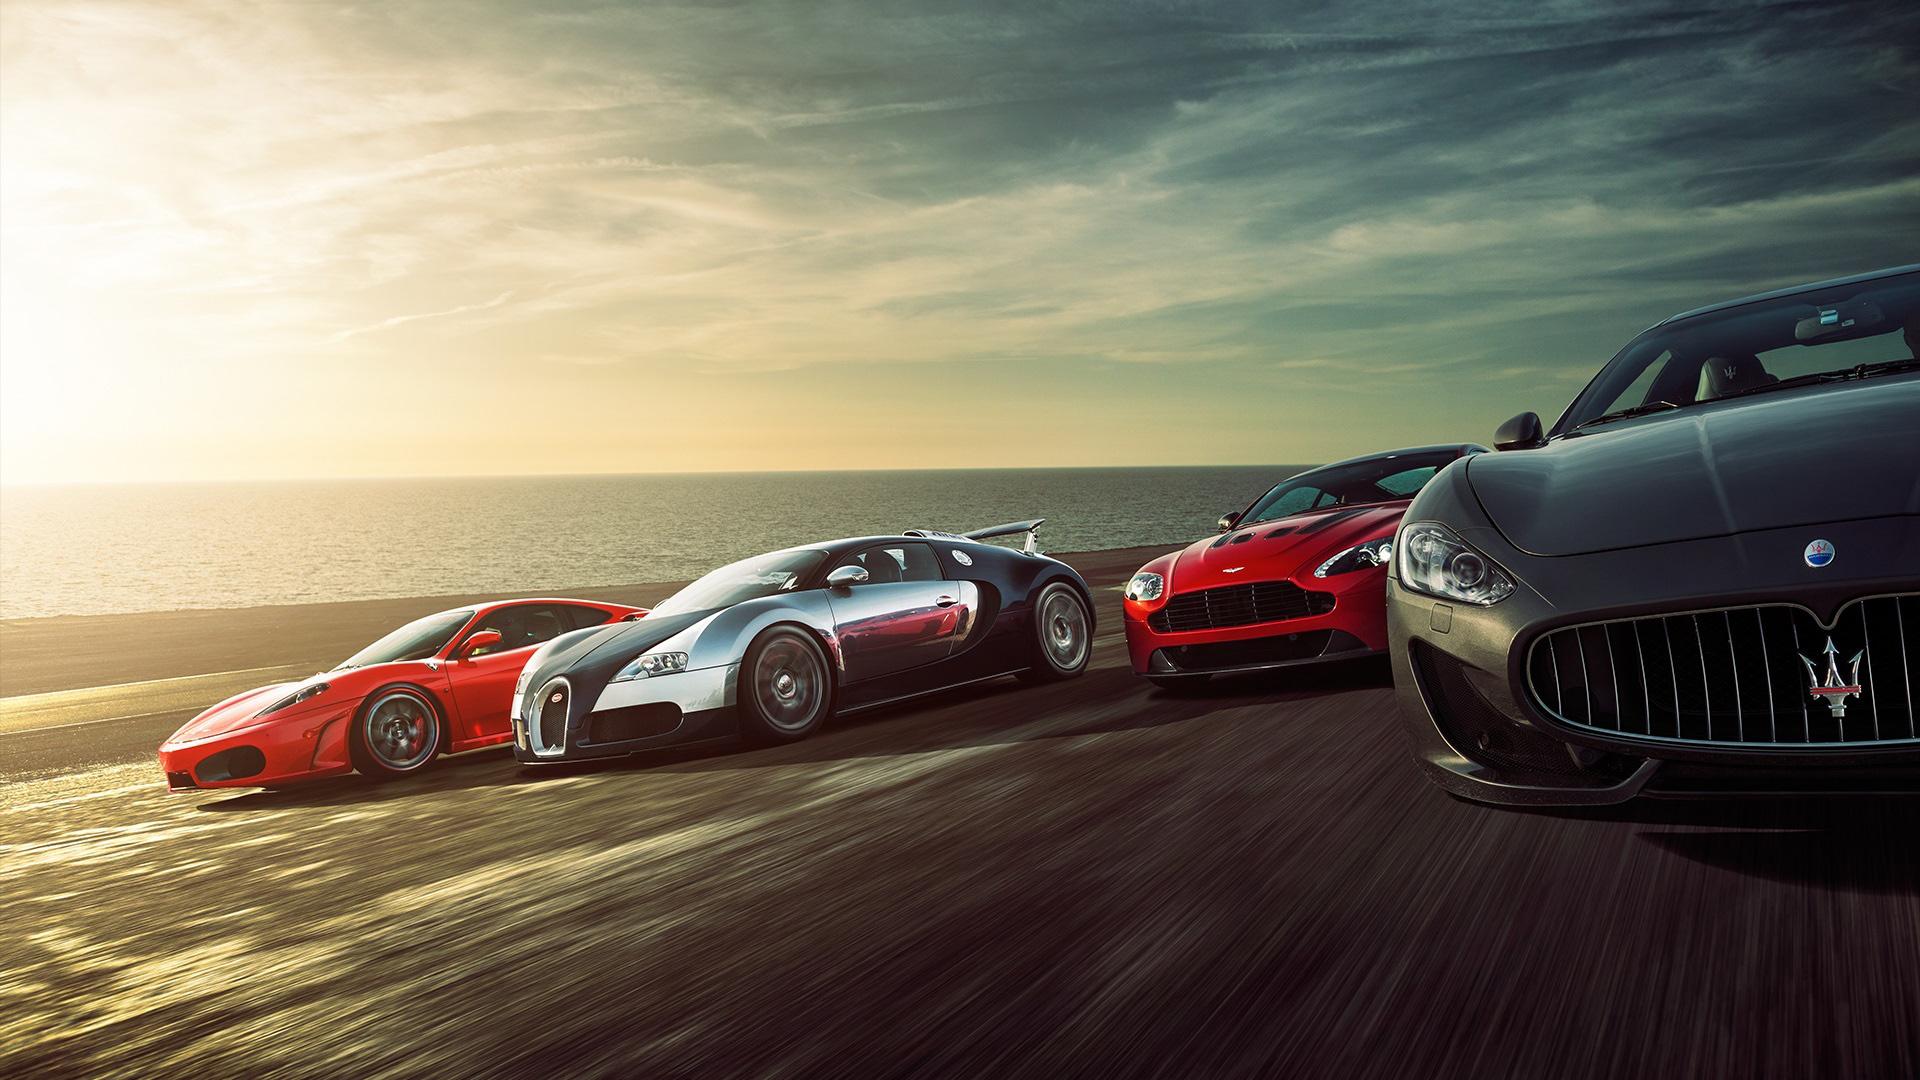 super sports cars wallpaper hd car wallpapers - Super Cool Cars Wallpapers Hd